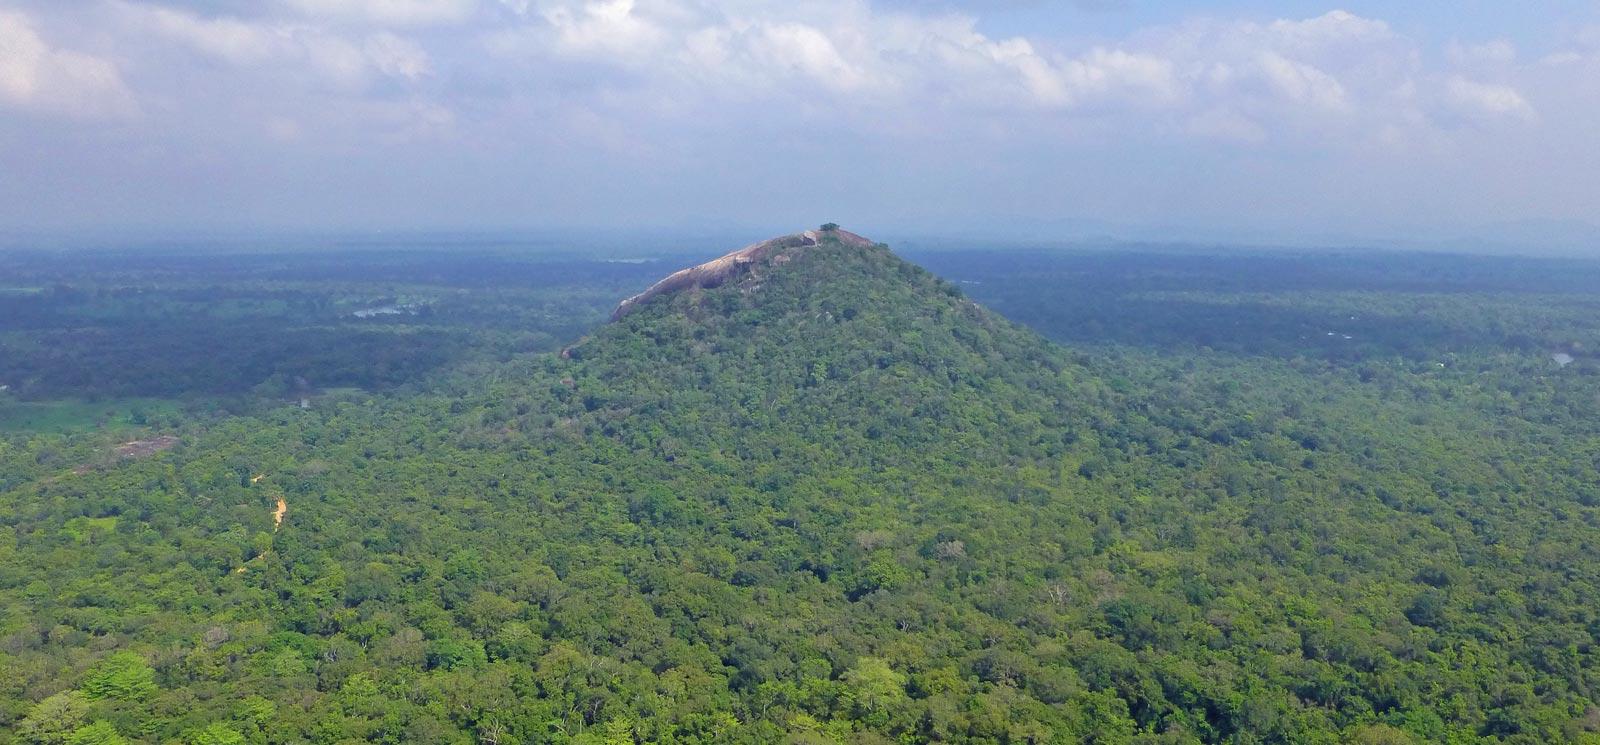 Pidurangal Rock Monastery in Sri Lanka